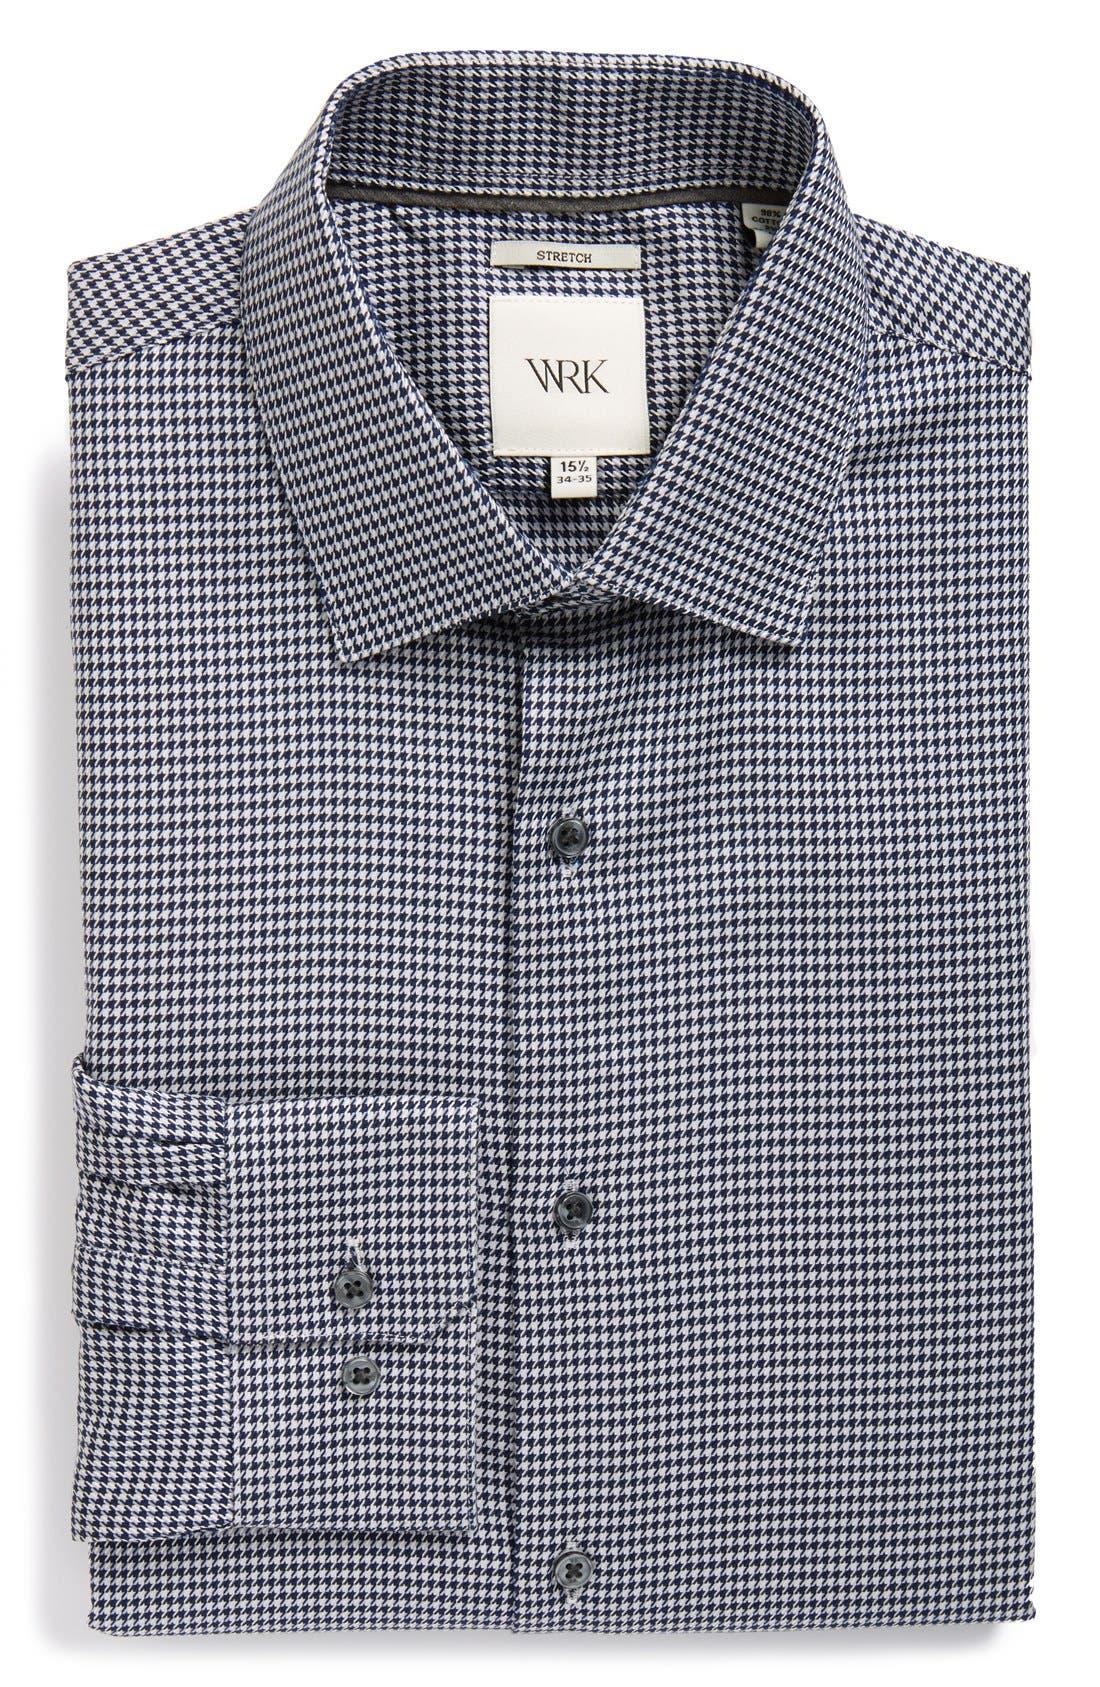 W.R.K Extra Trim Fit Stretch Houndstooth Dress Shirt